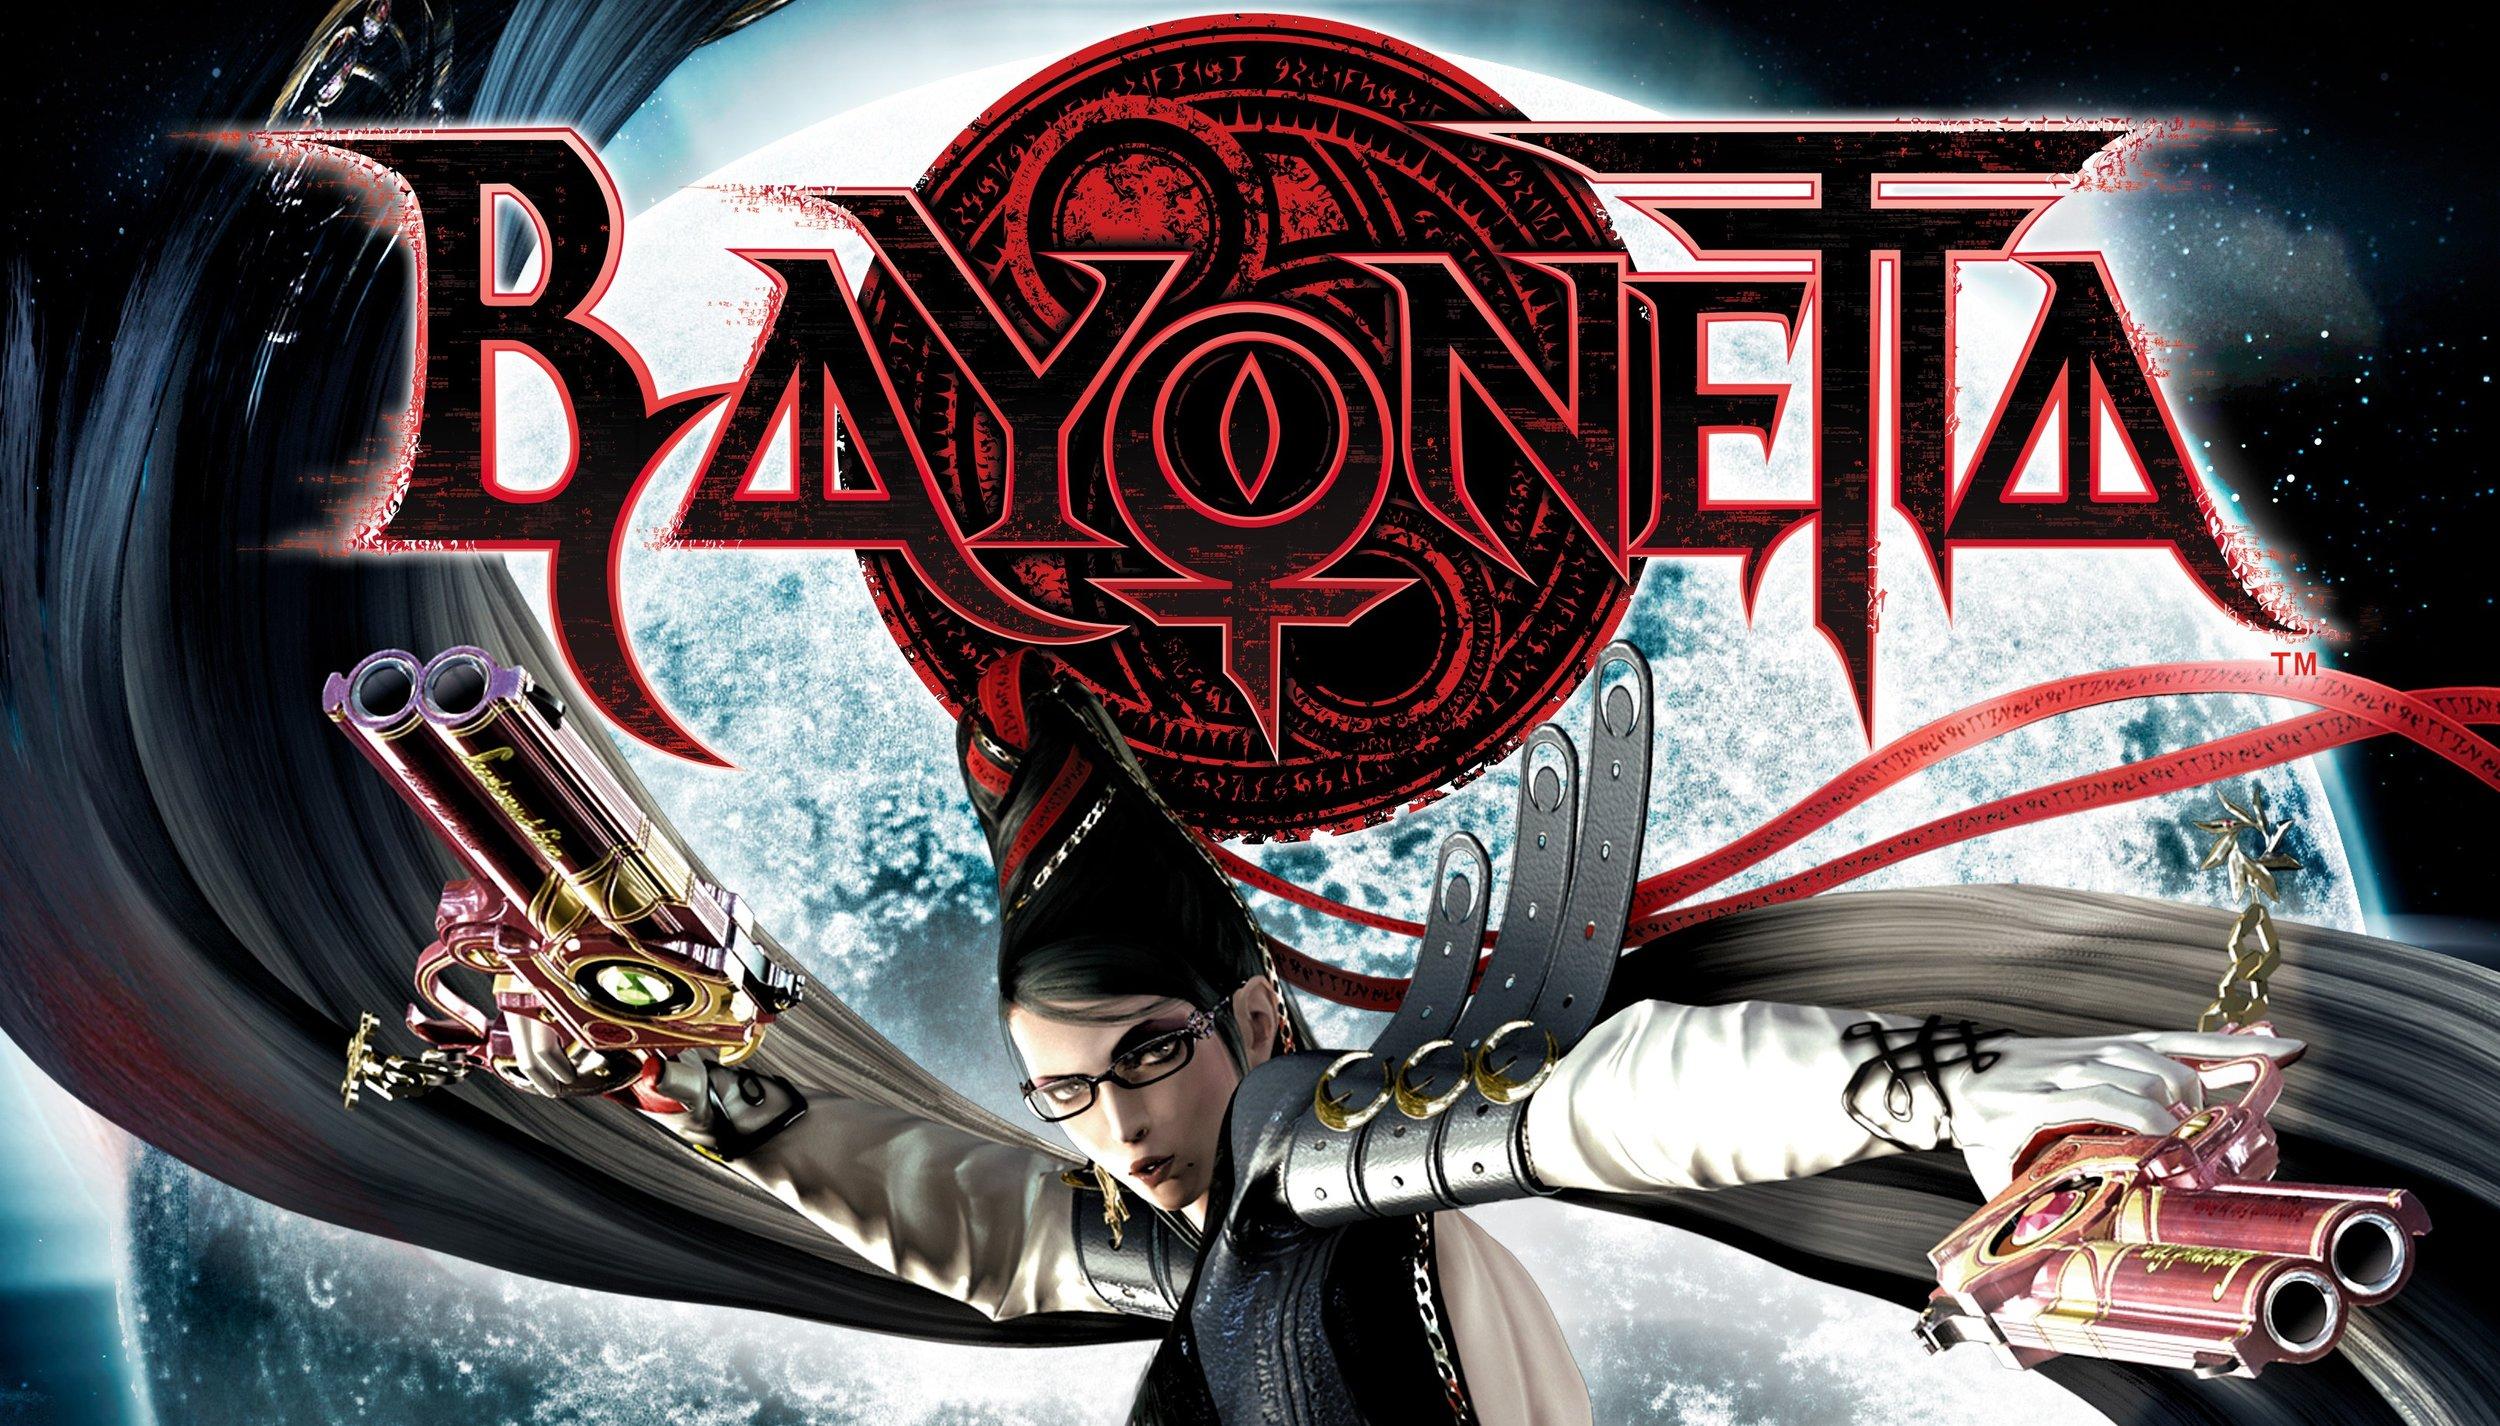 Bayonetta Heading to Switch - https://www.polygon.com/2017/12/7/16750044/bayonetta-nintendo-switch-date-trailer-tga-2017